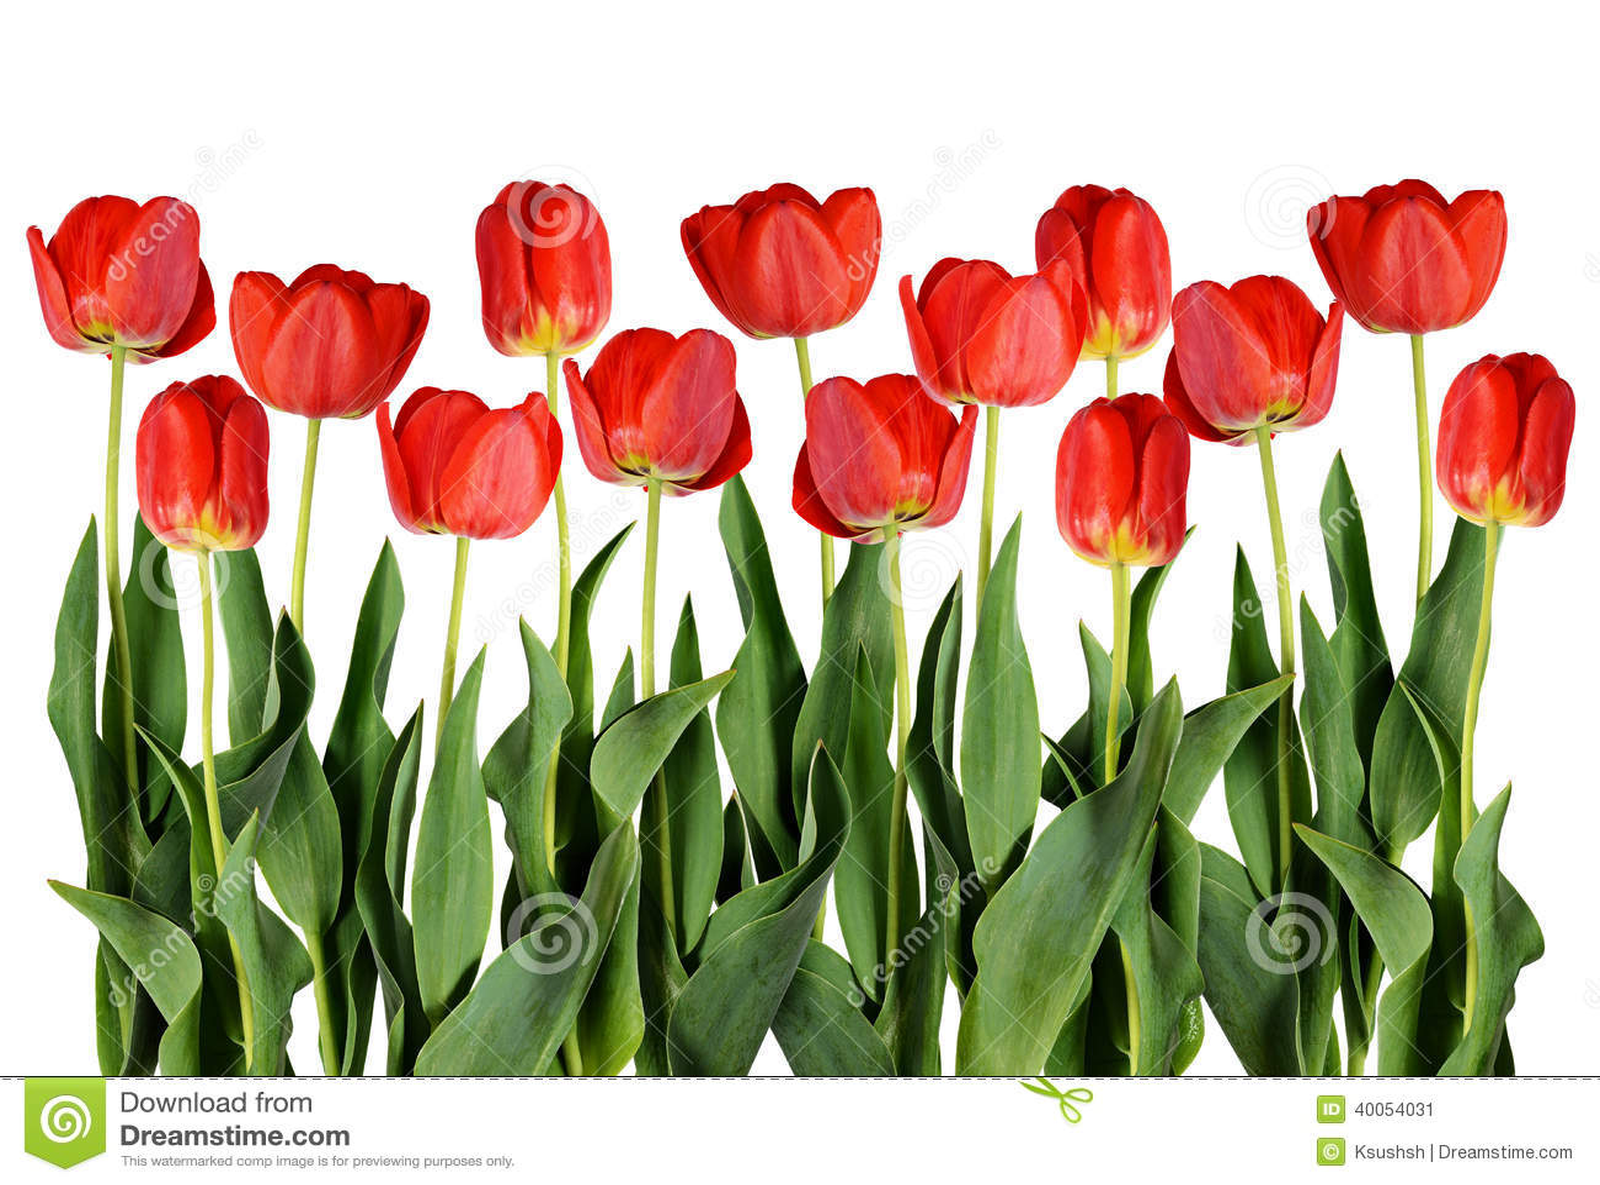 red tulip flowers. stock image  image, Beautiful flower